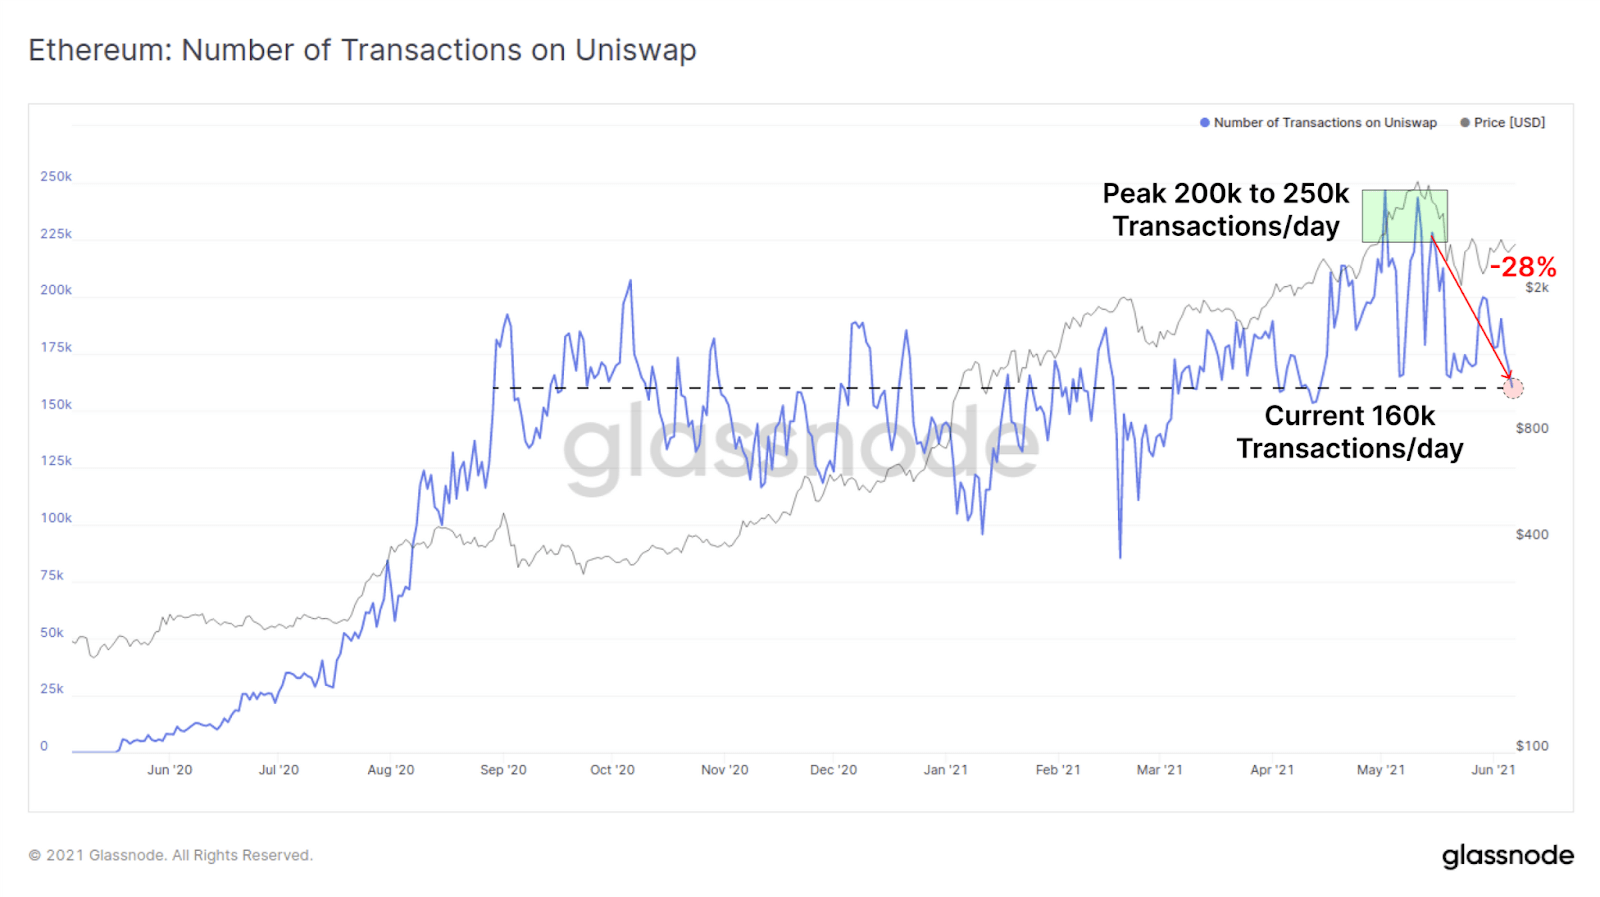 Ethereum ETH Uniswap Transactions